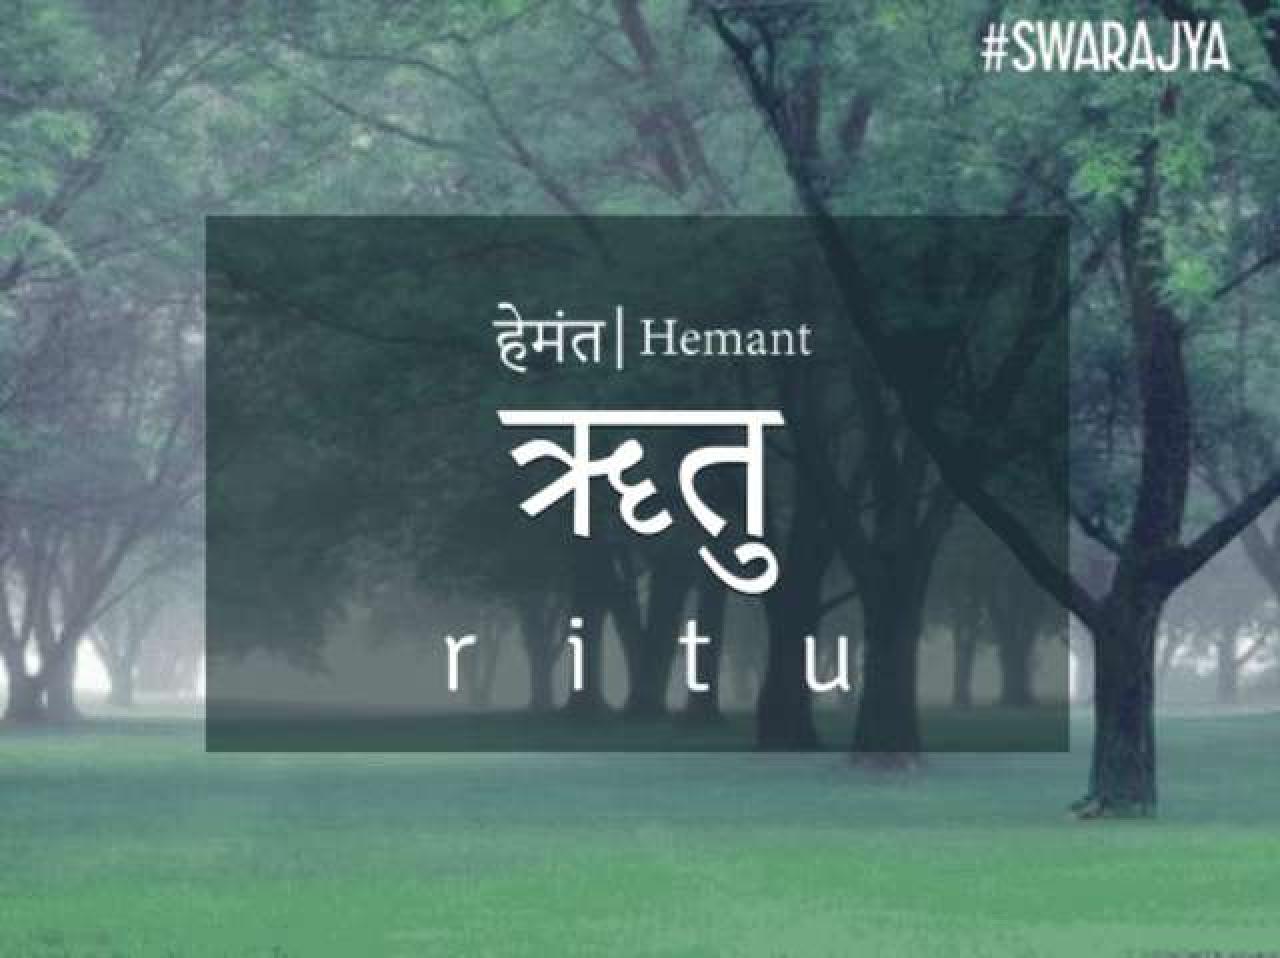 Hemant Ritu.